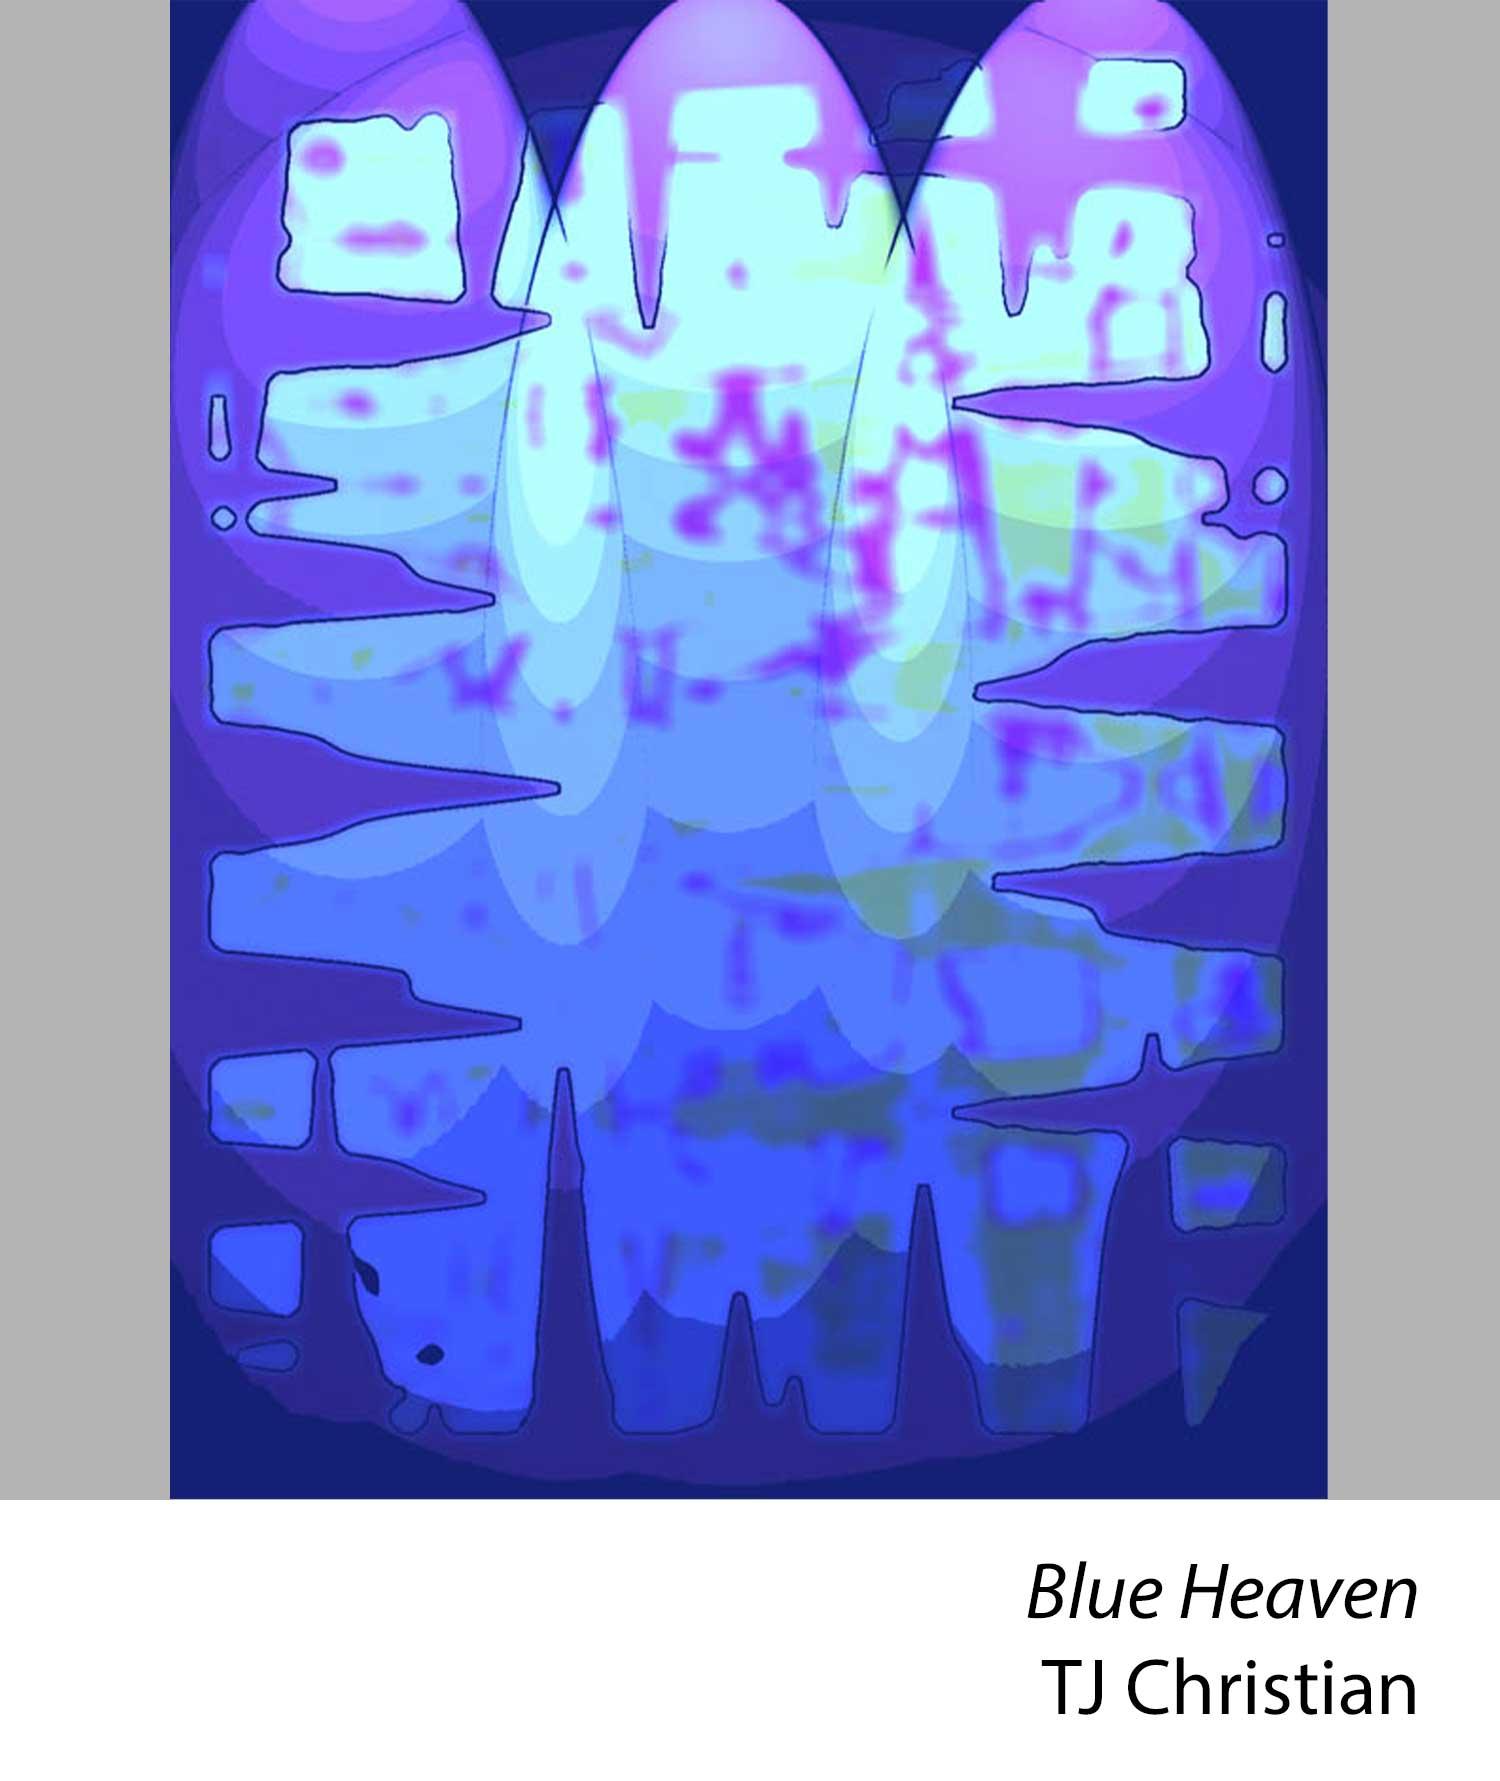 Blue Heaven by TJ Christian